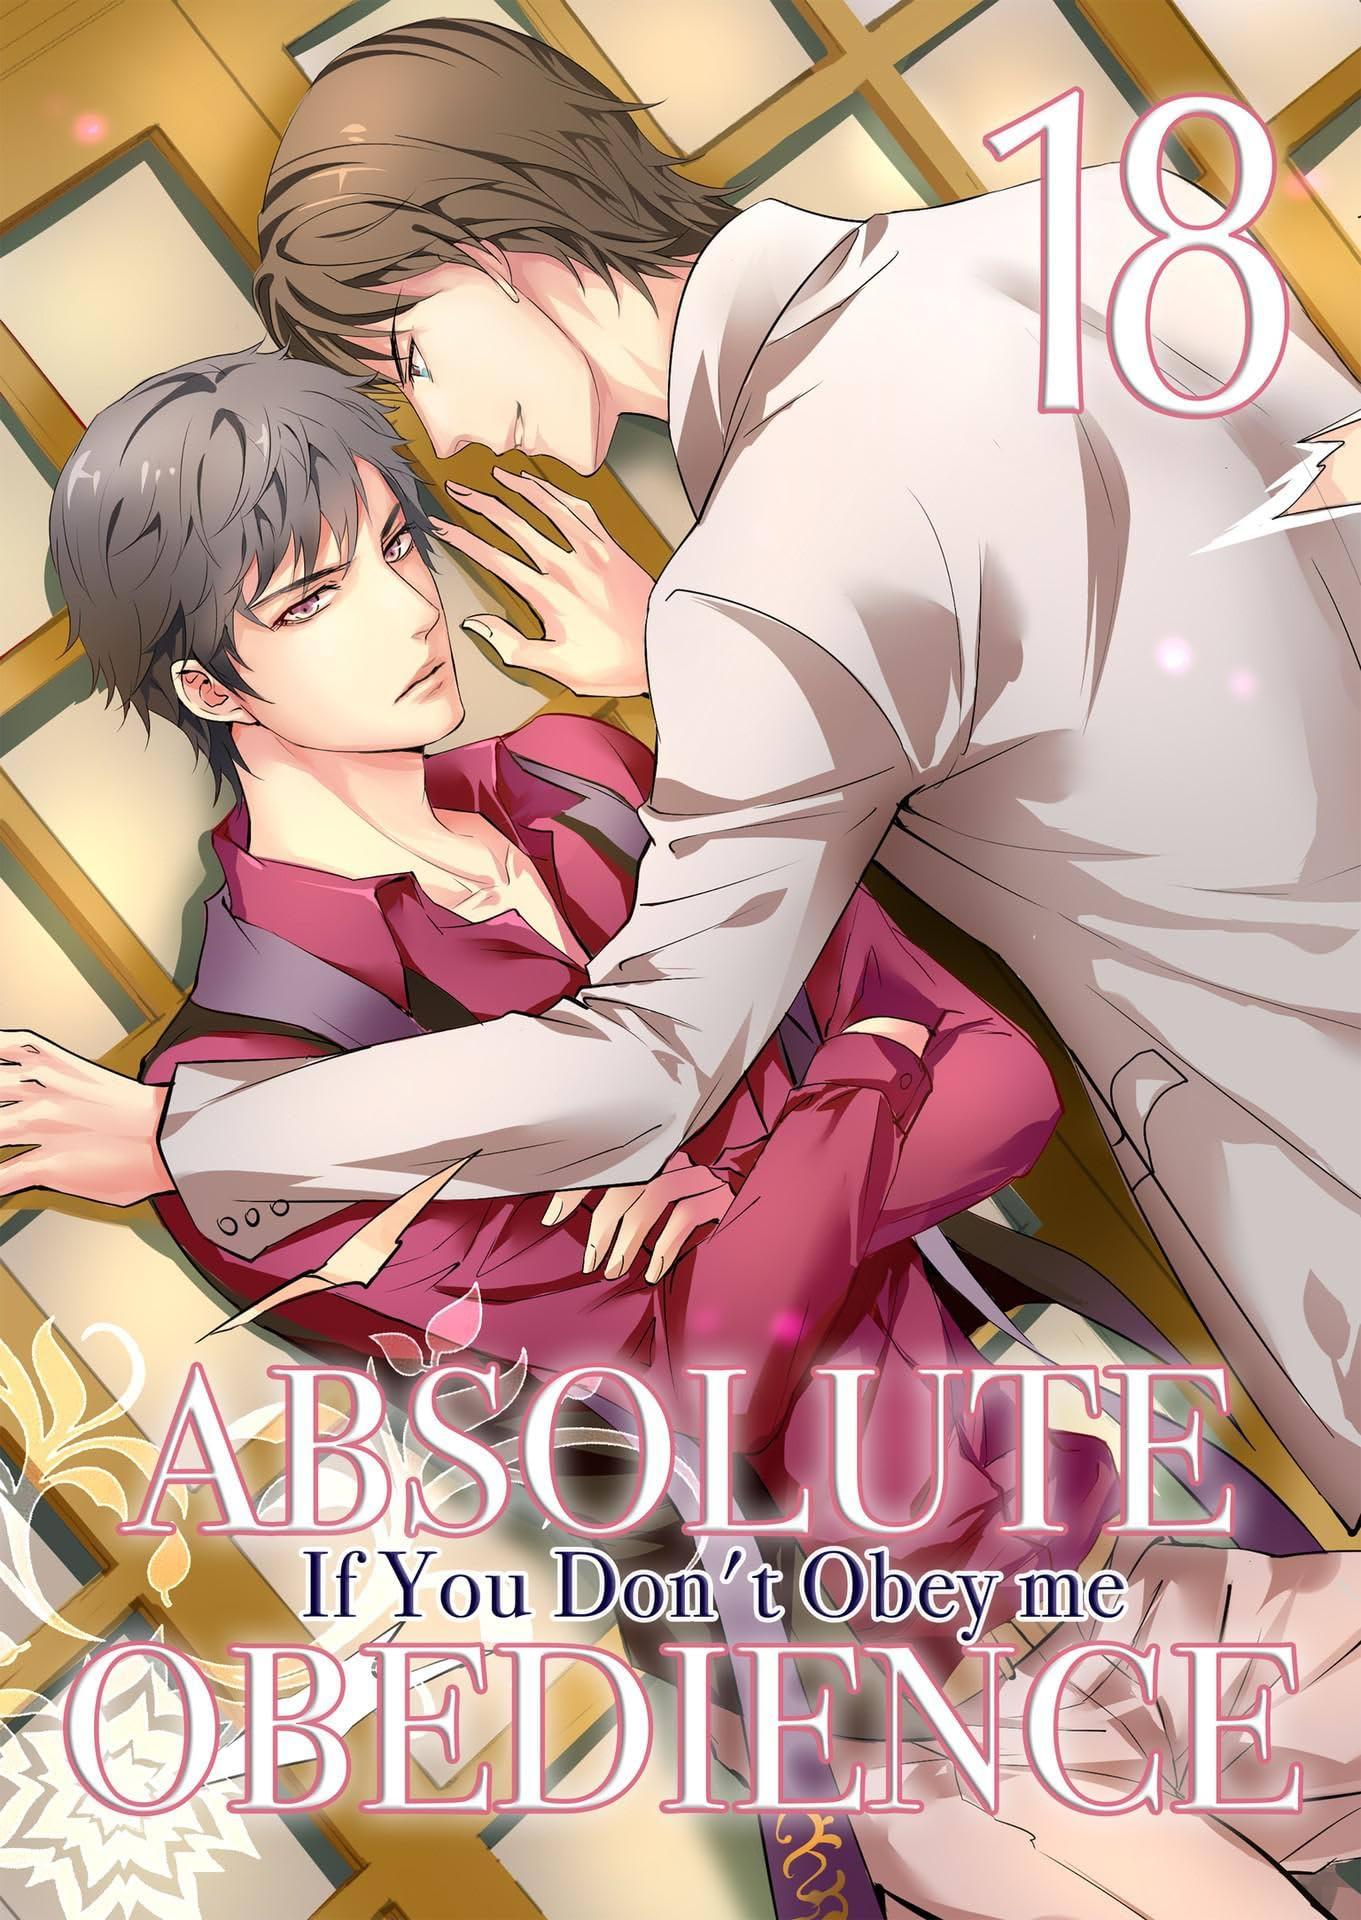 Absolute Obedience If You Don T Obey Me Yaoi Manga Vol 18 Eu Comics By Comixology